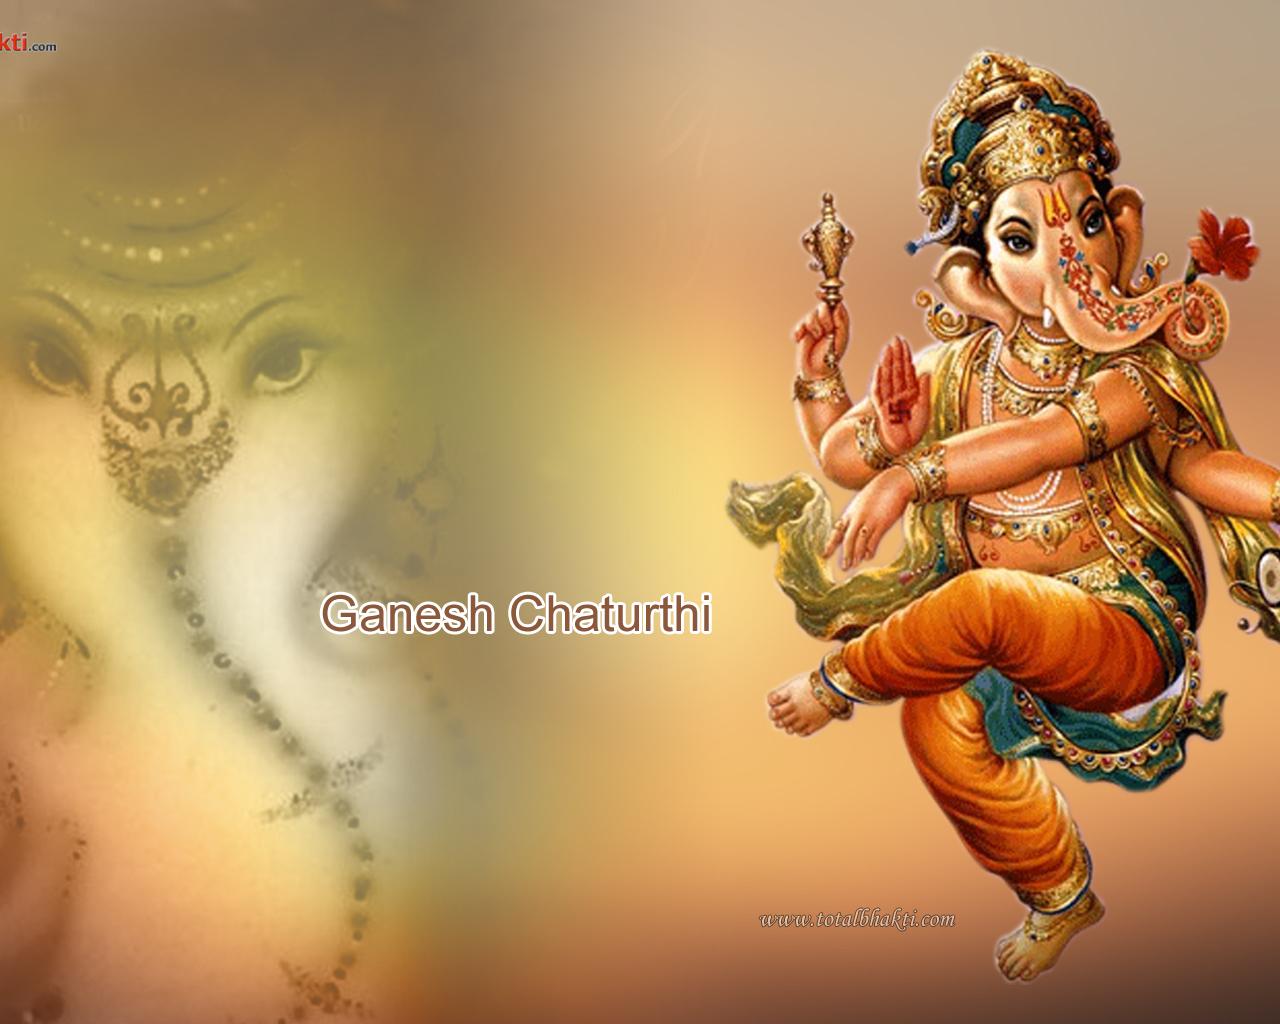 Free Download Ganesh Chaturthi 2013 Ganesh Chaturthi Wishes Wallpapers Ganesha 1600x1024 For Your Desktop Mobile Tablet Explore 77 Ganesh Background Ganesh Wallpapers For Desktop Ganesha Wallpaper Hd Ganpati Wallpaper Hd